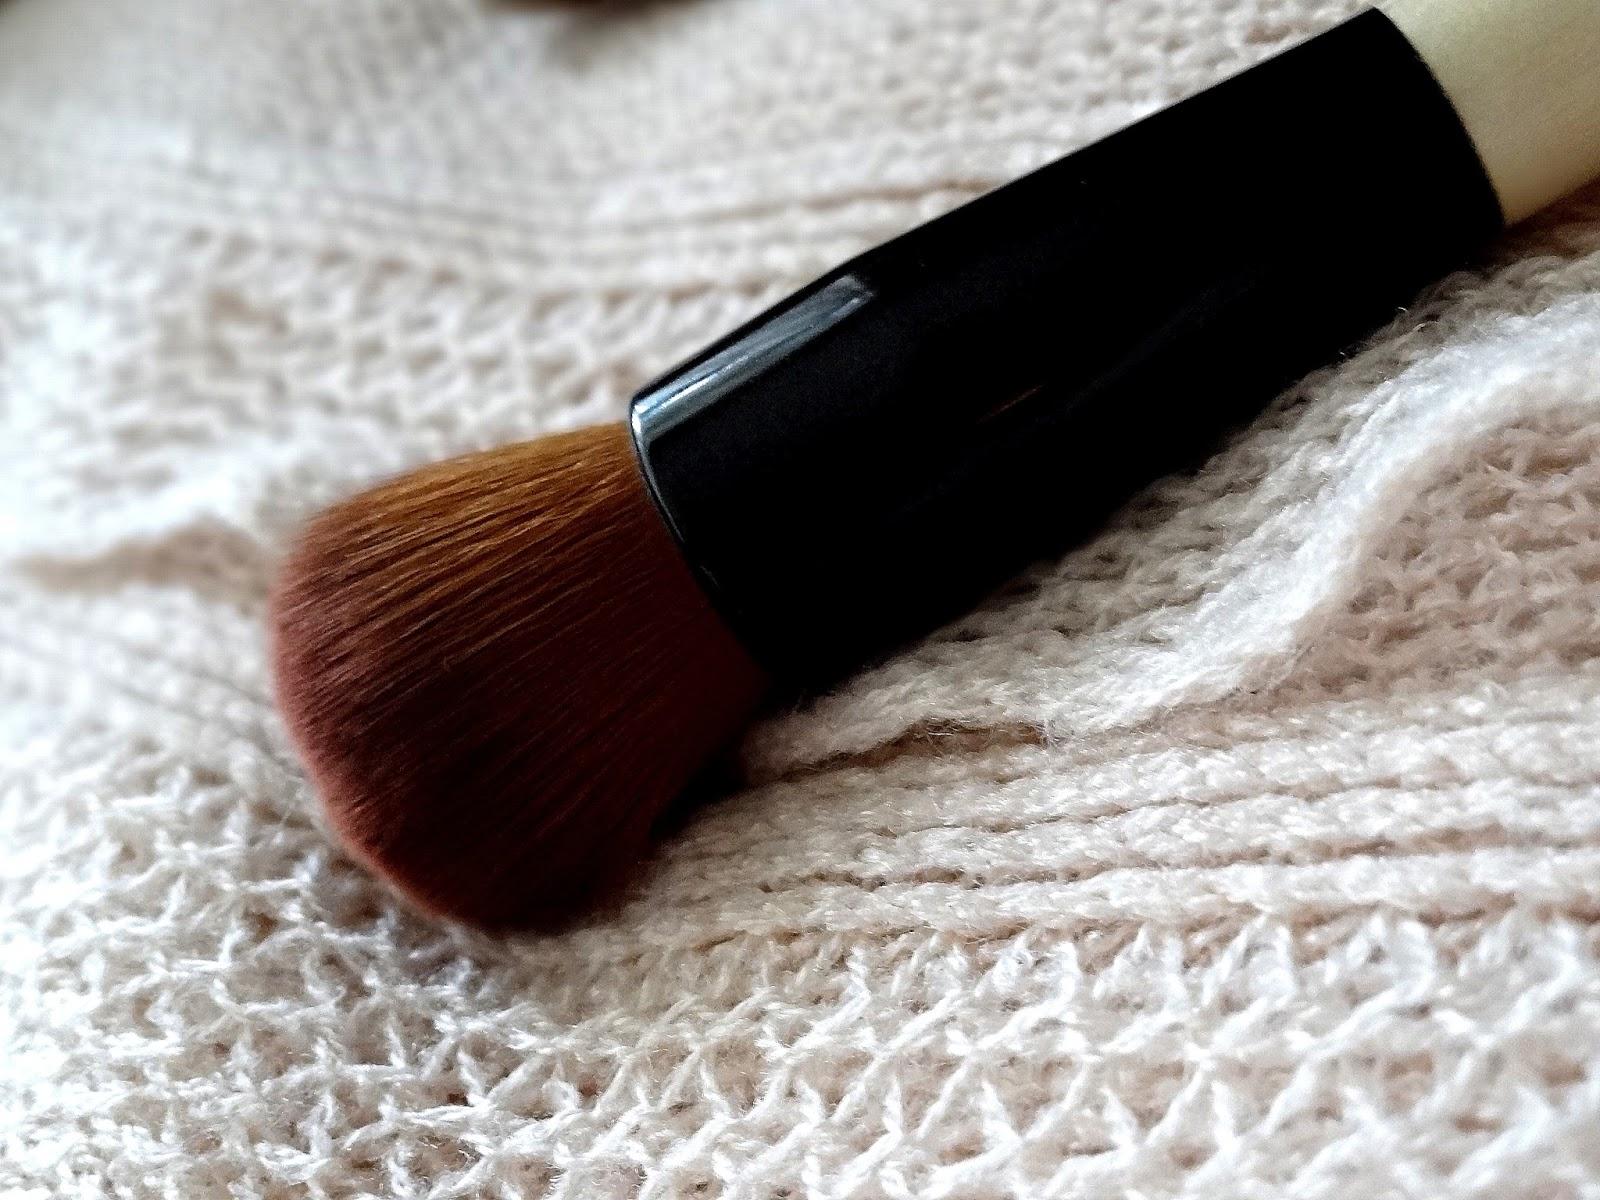 Bobbi Brown Full Coverage Face Brush Review, Photos